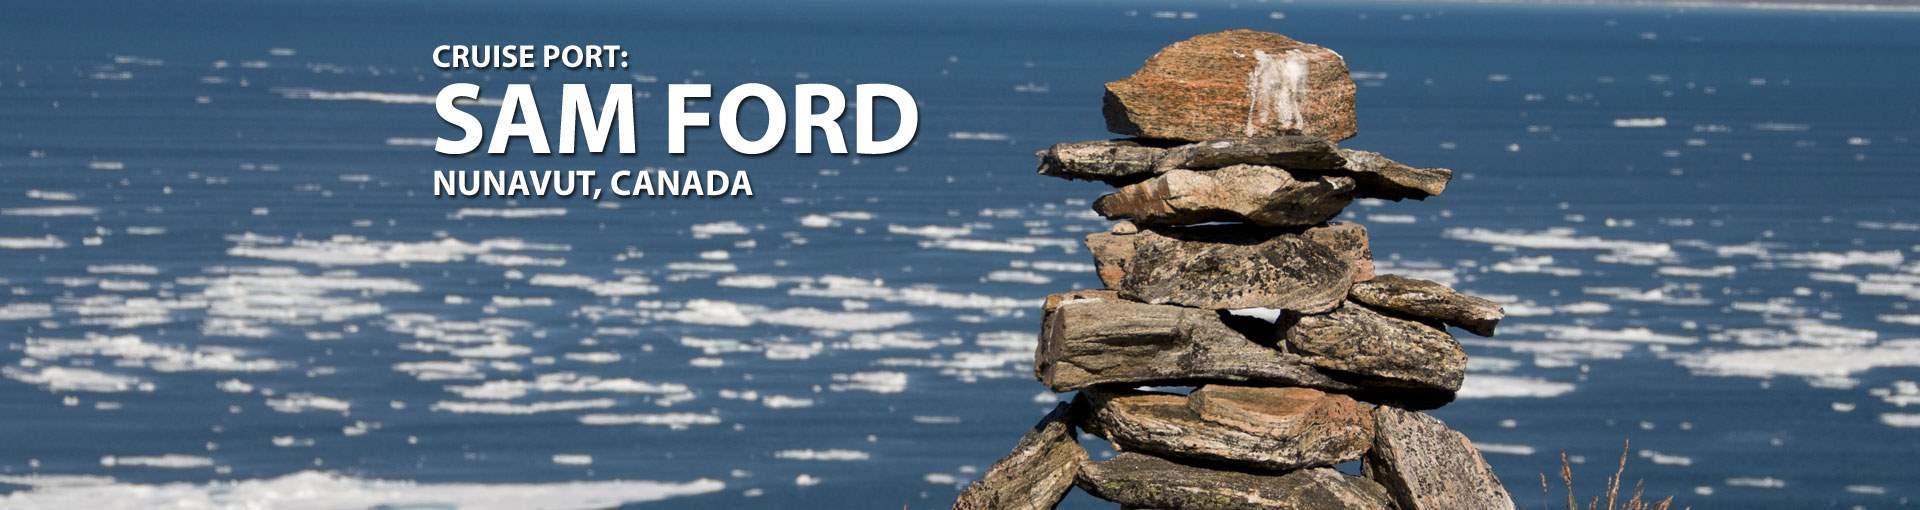 Cruises to Sam Ford Fjord, Nunavut, Canada